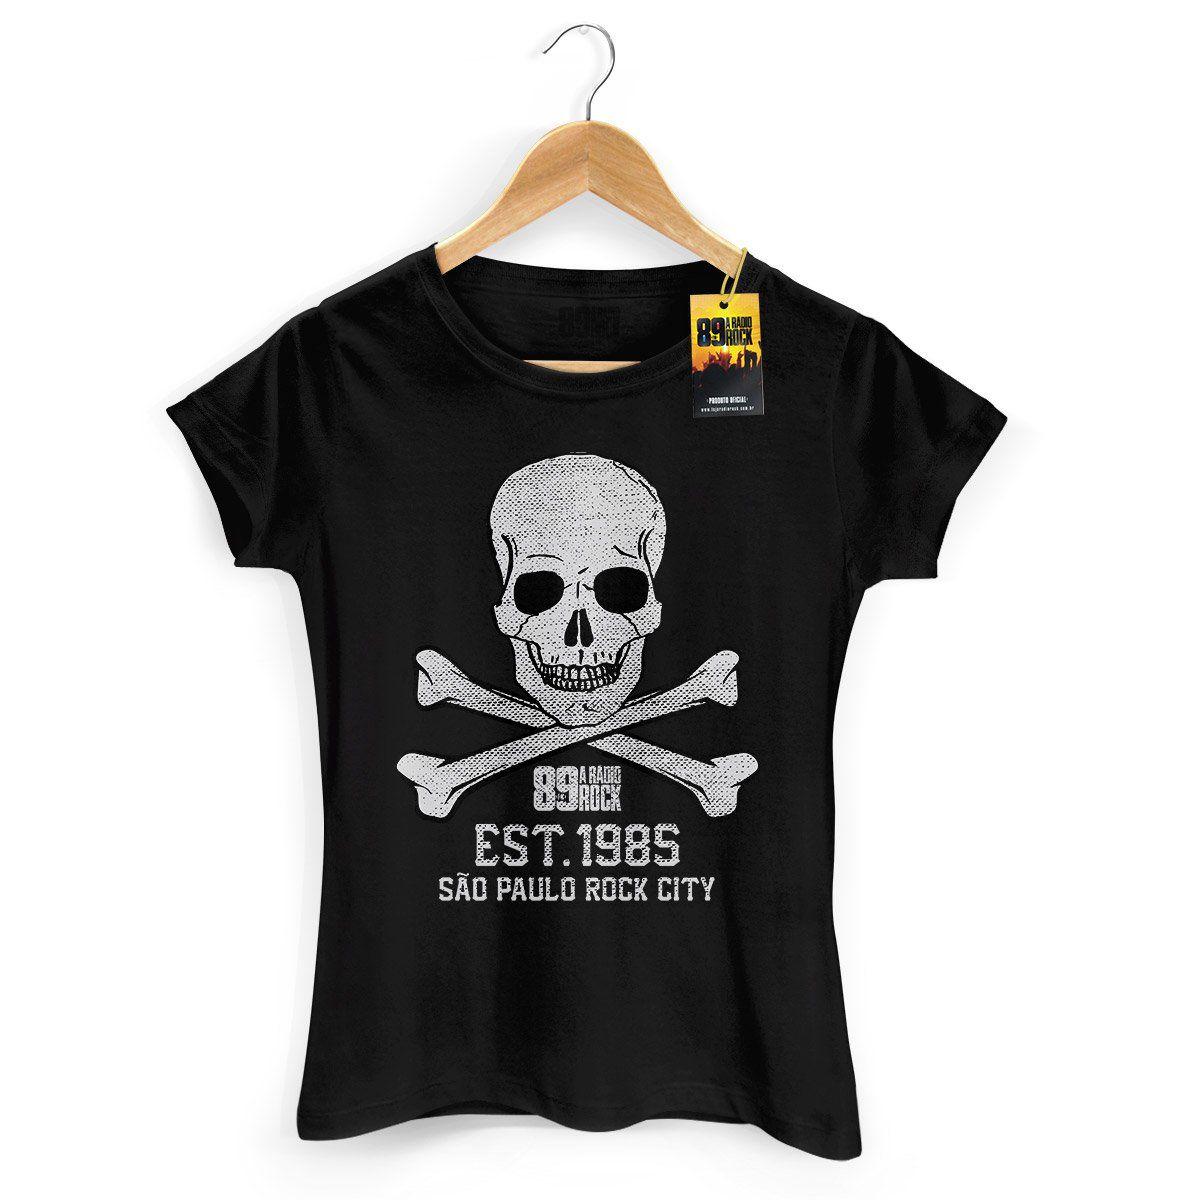 Camiseta Feminina 89 FM A Rádio Rock Est 1985  - bandUP Store Marketplace